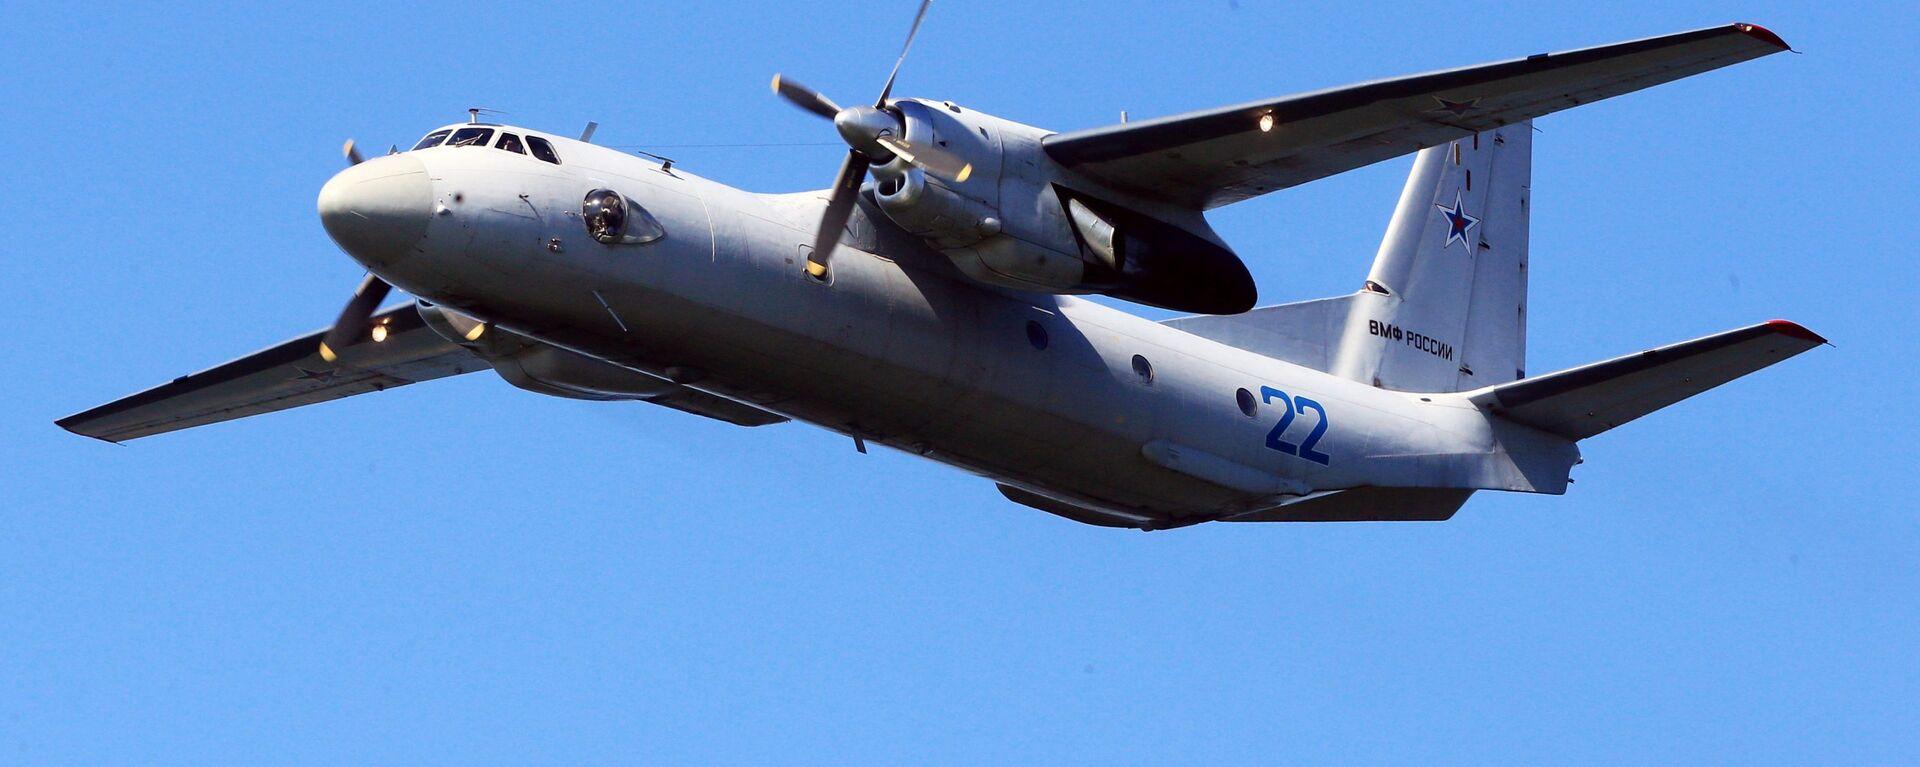 Samolot An-26 - Sputnik Polska, 1920, 23.09.2021